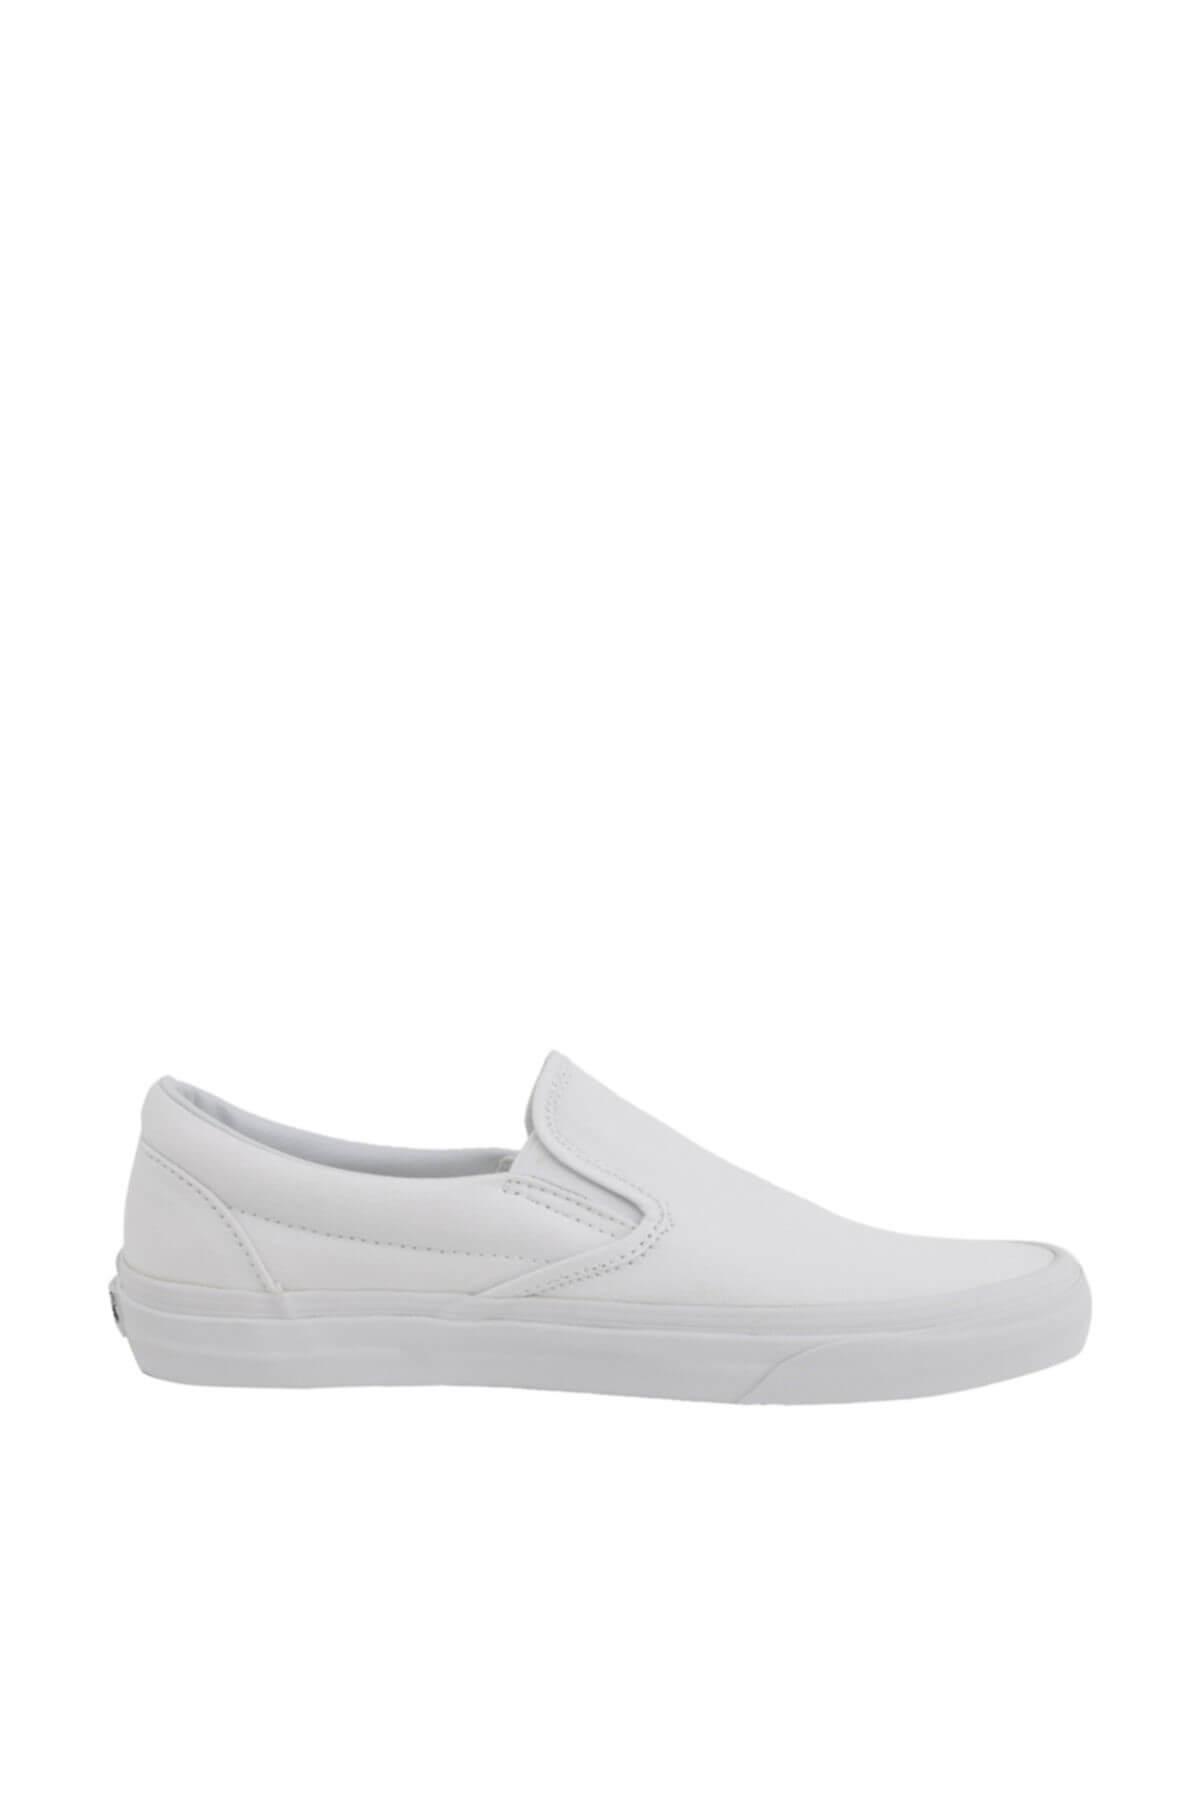 Vans Unisex Sneaker - Classic Slip-On - VEYEW00 2